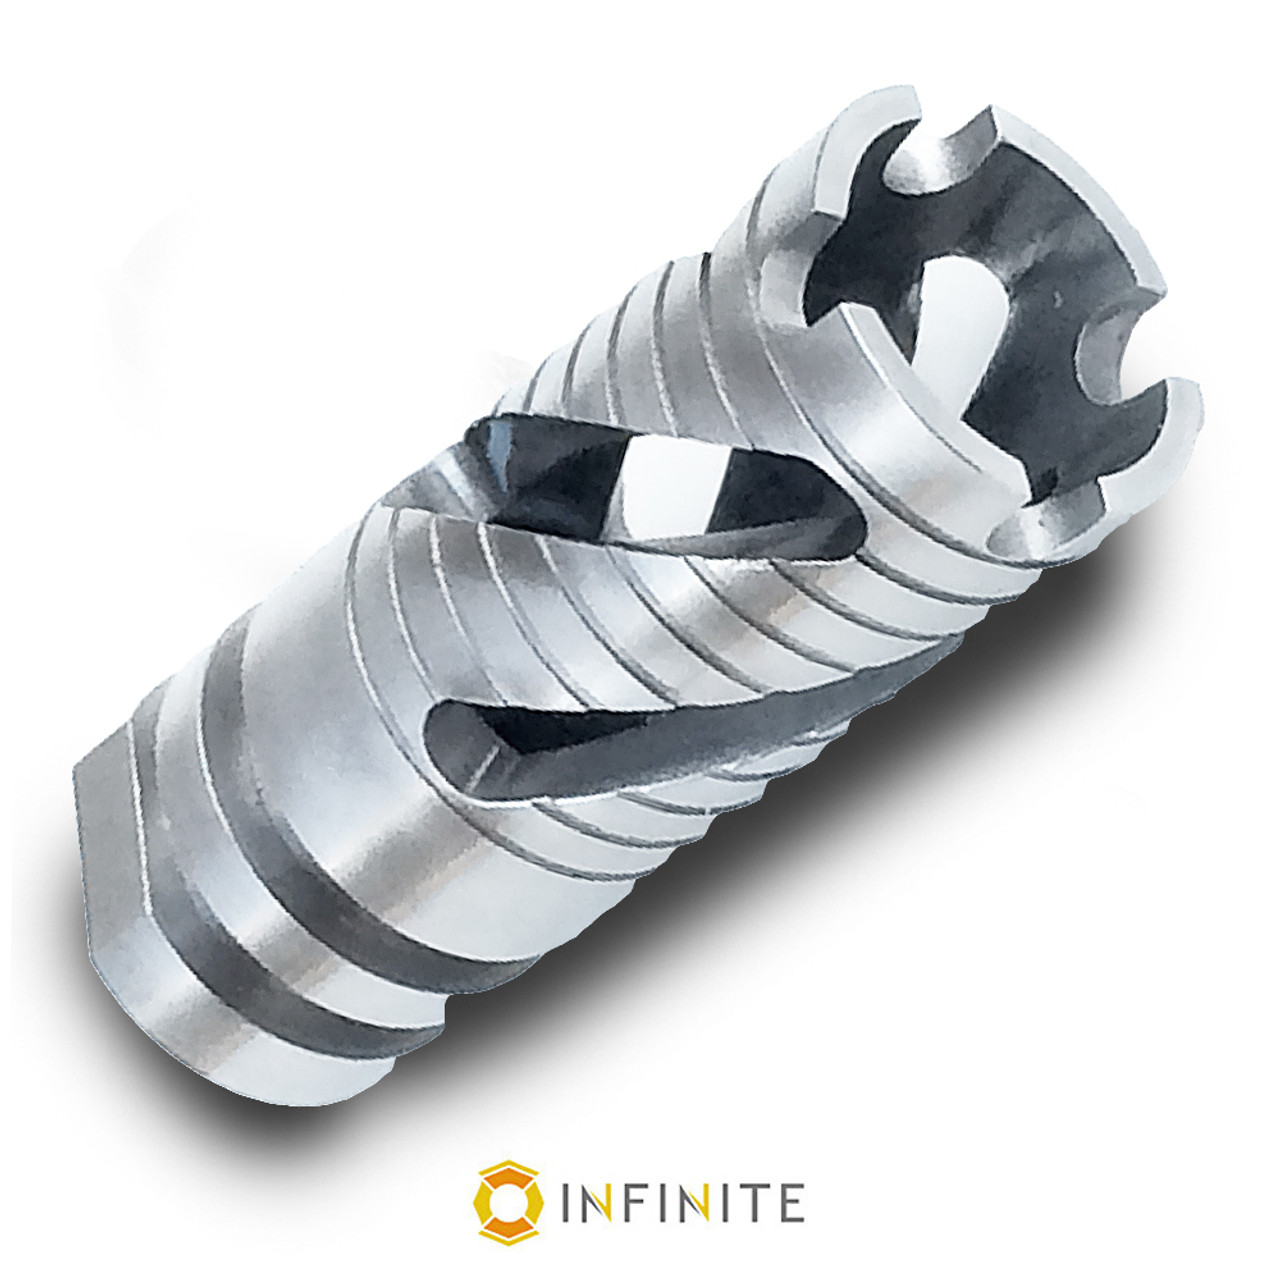 14mm x 1 RH Spiral Phantom Muzzle Device - Stainless Steel